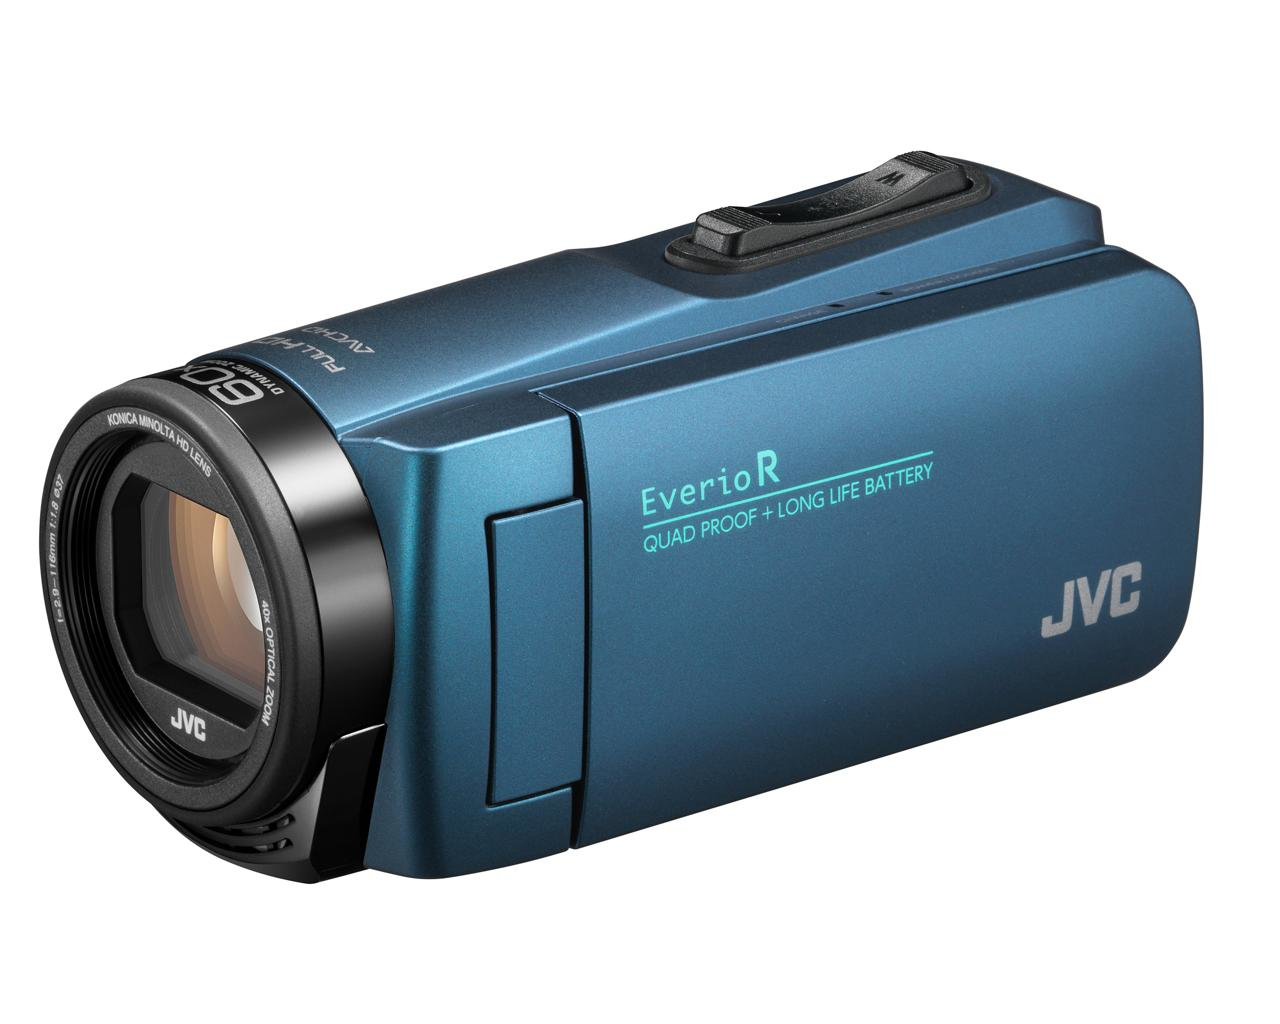 JVC GZ-R495A Handheld camcorder 2.5MP CMOS Full HD Blue